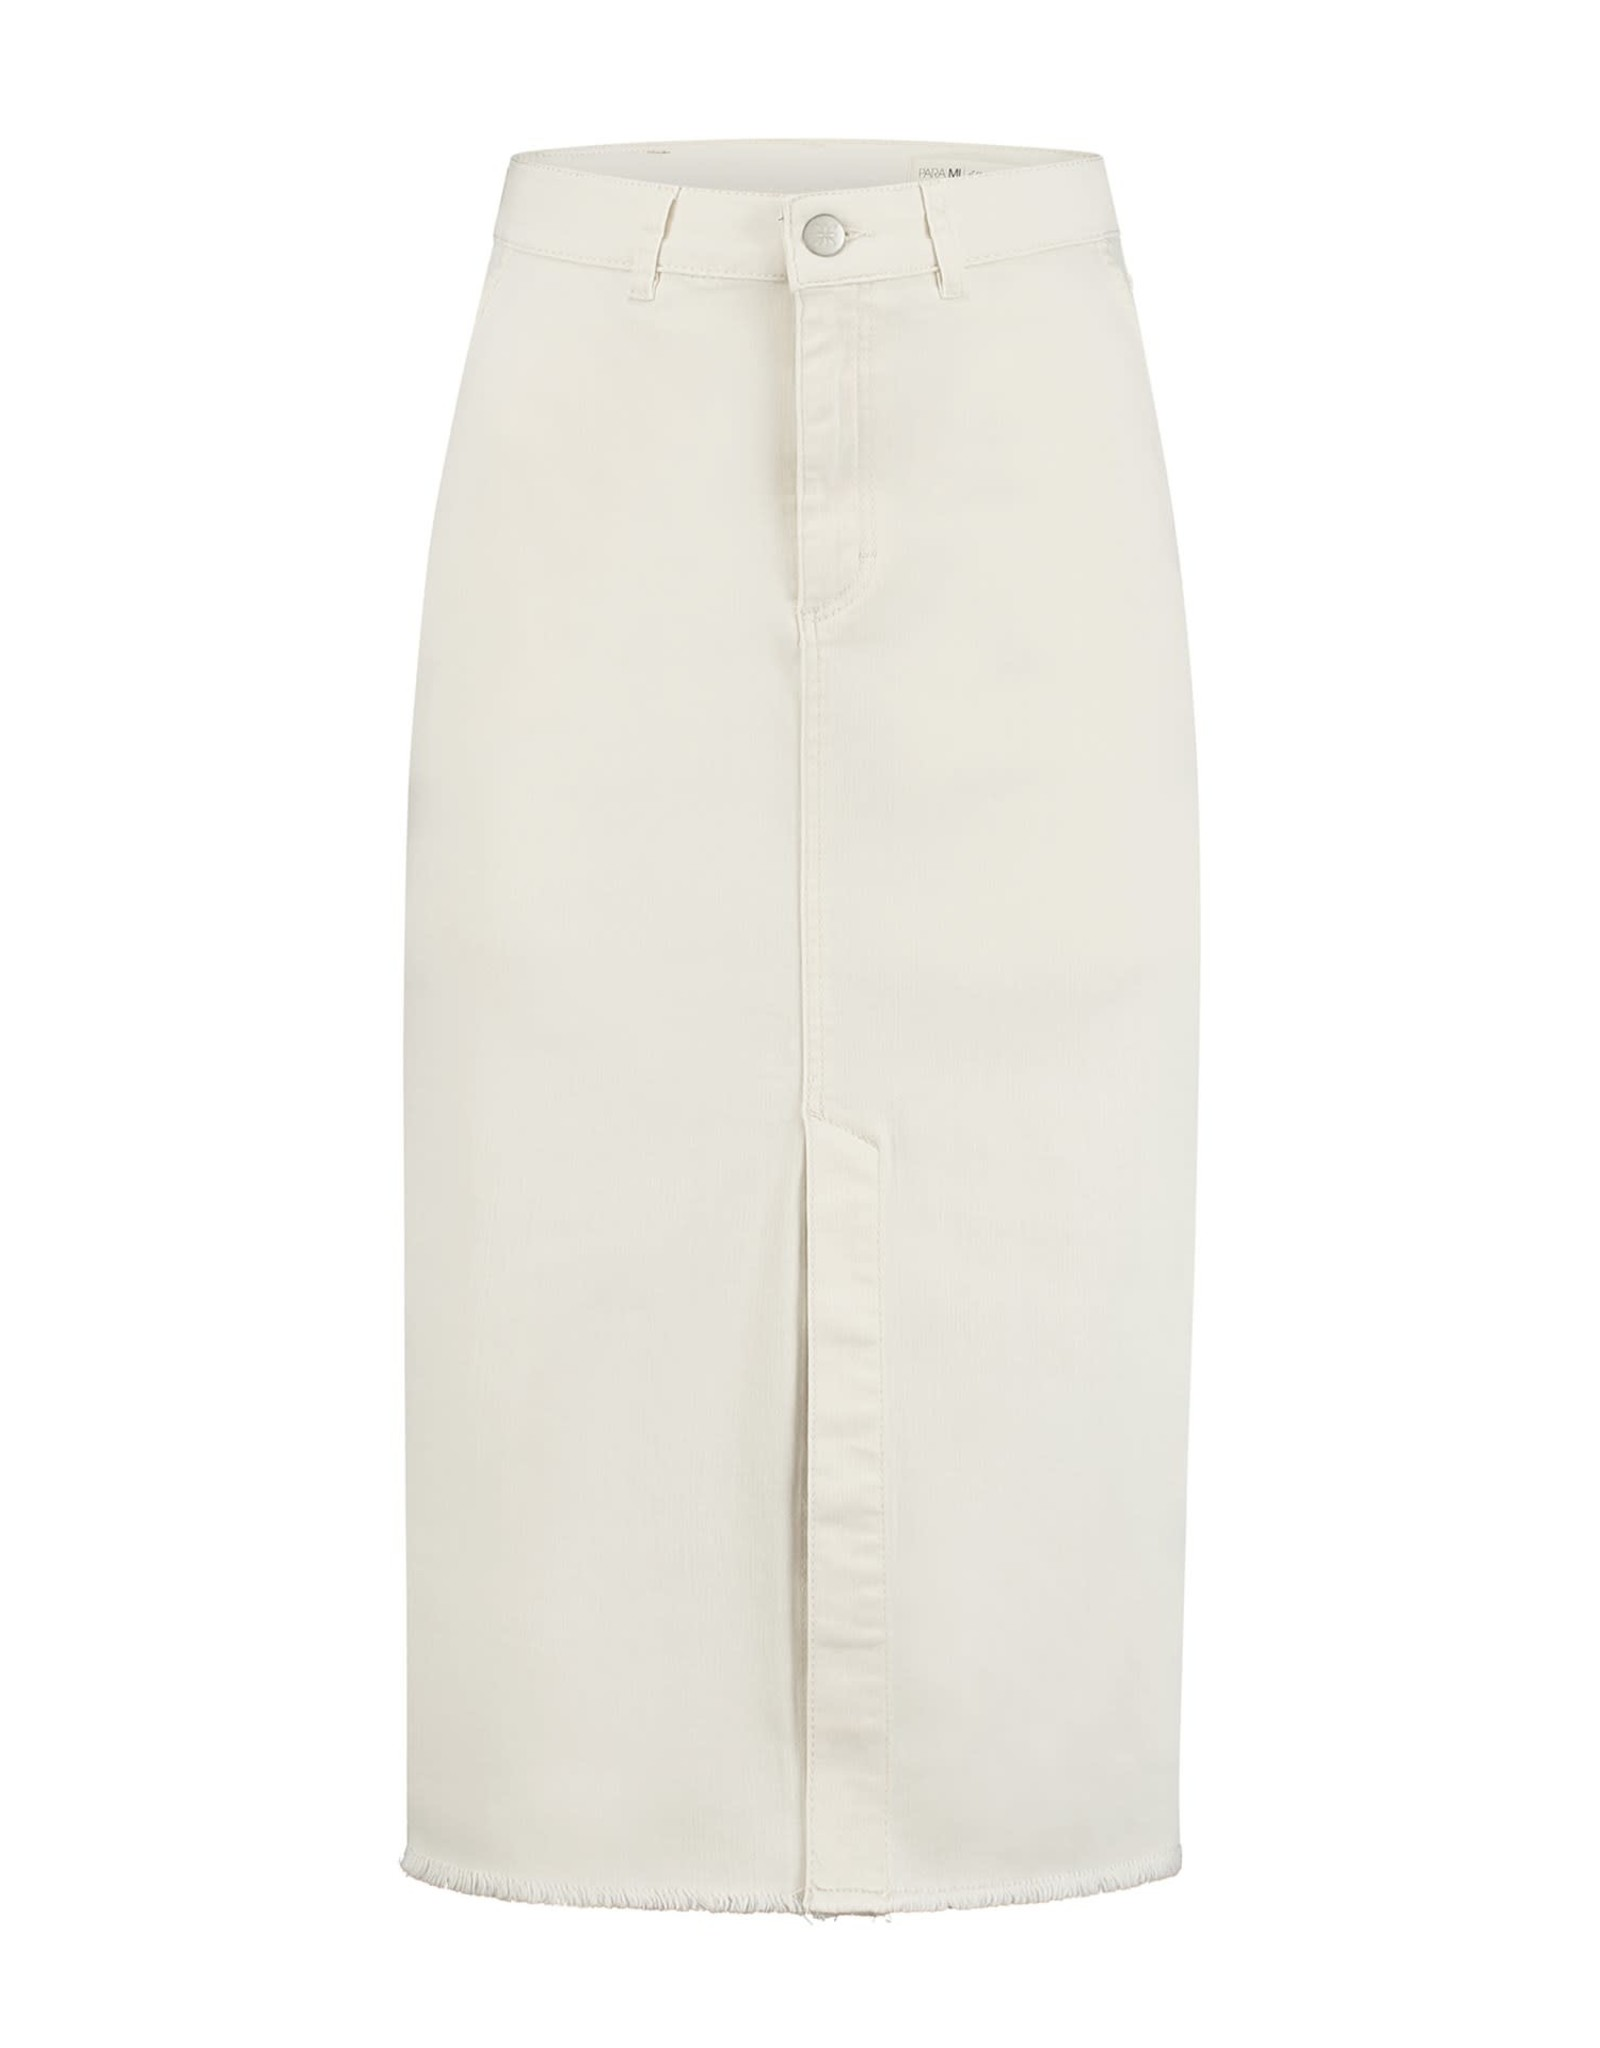 Para Mi July Skirt / Color Denim  SS211.005162